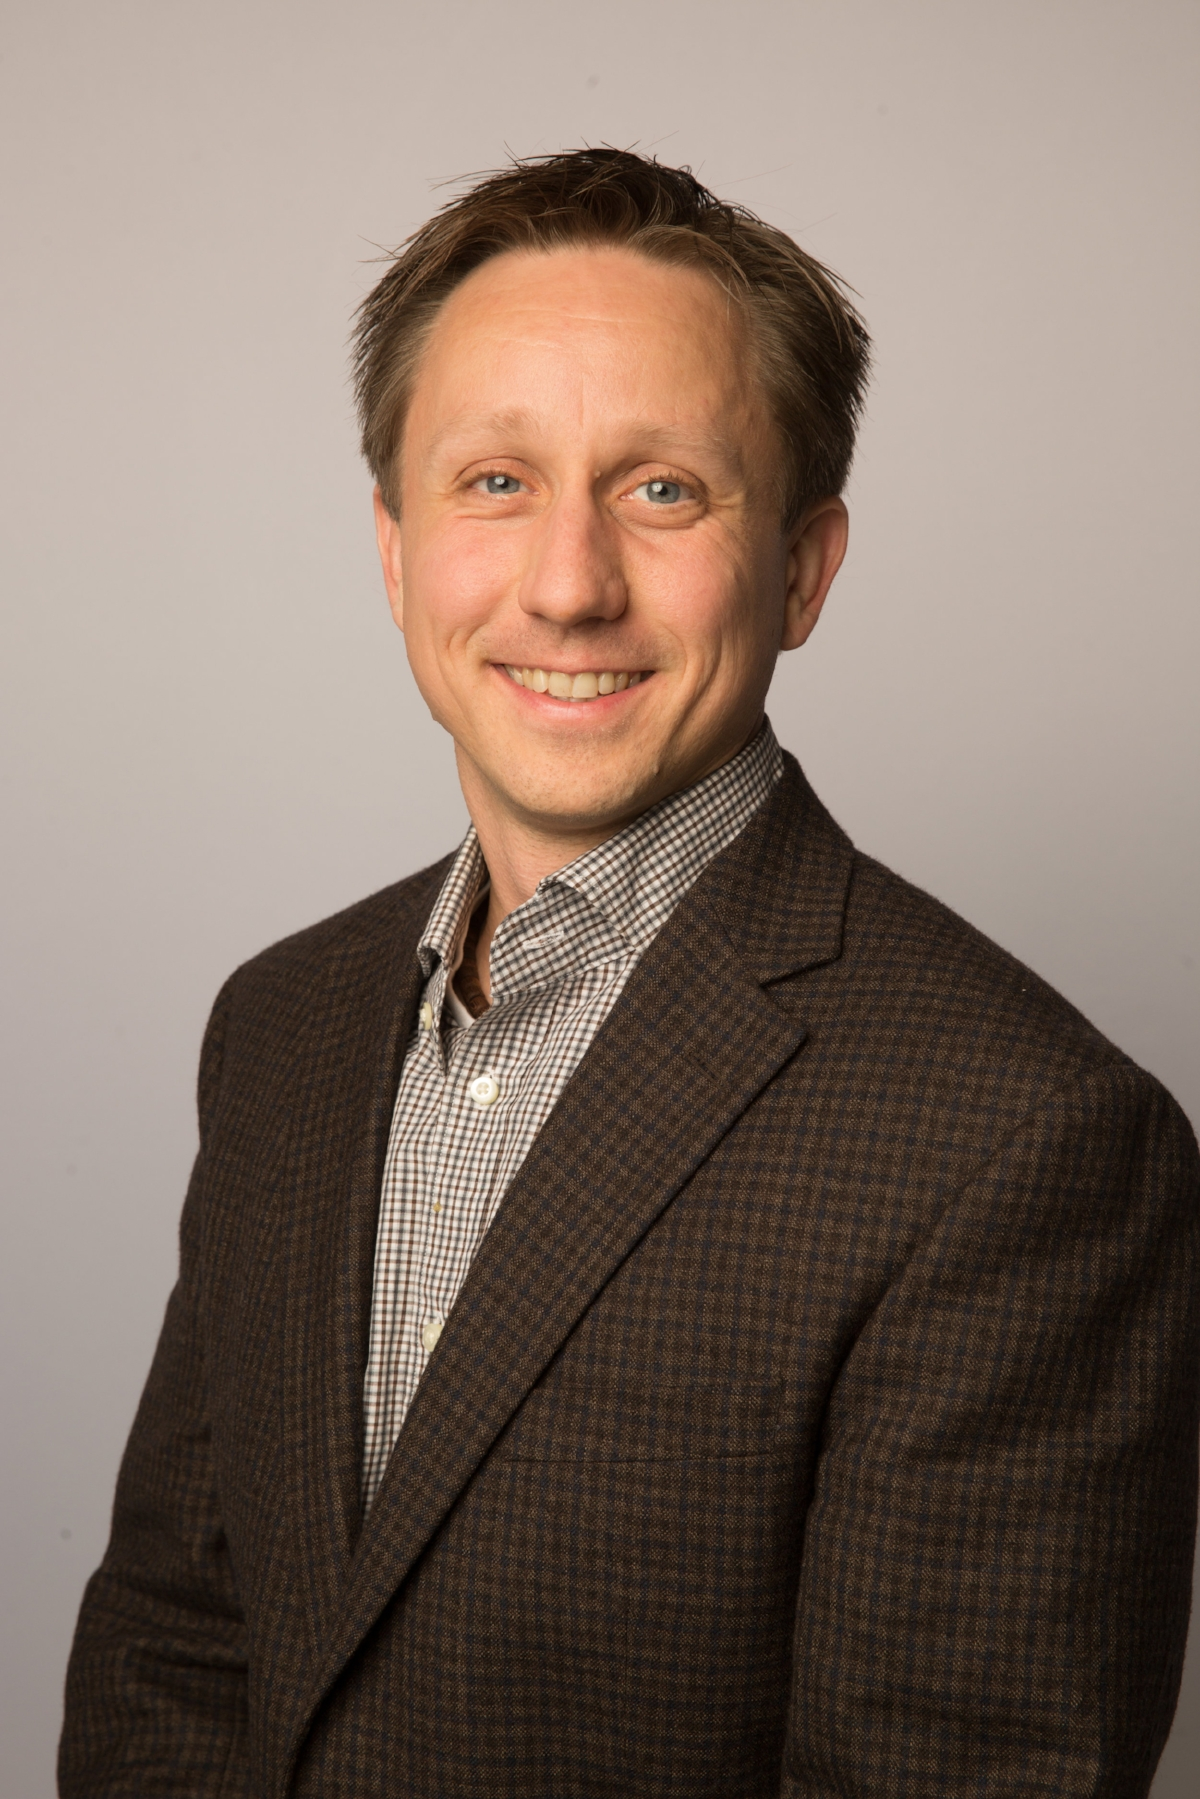 - Michael Puskarich, MDAssociate Professor and Research DirectorDepartment of Emergency MedicineUniversity of Mississippi Medical Center